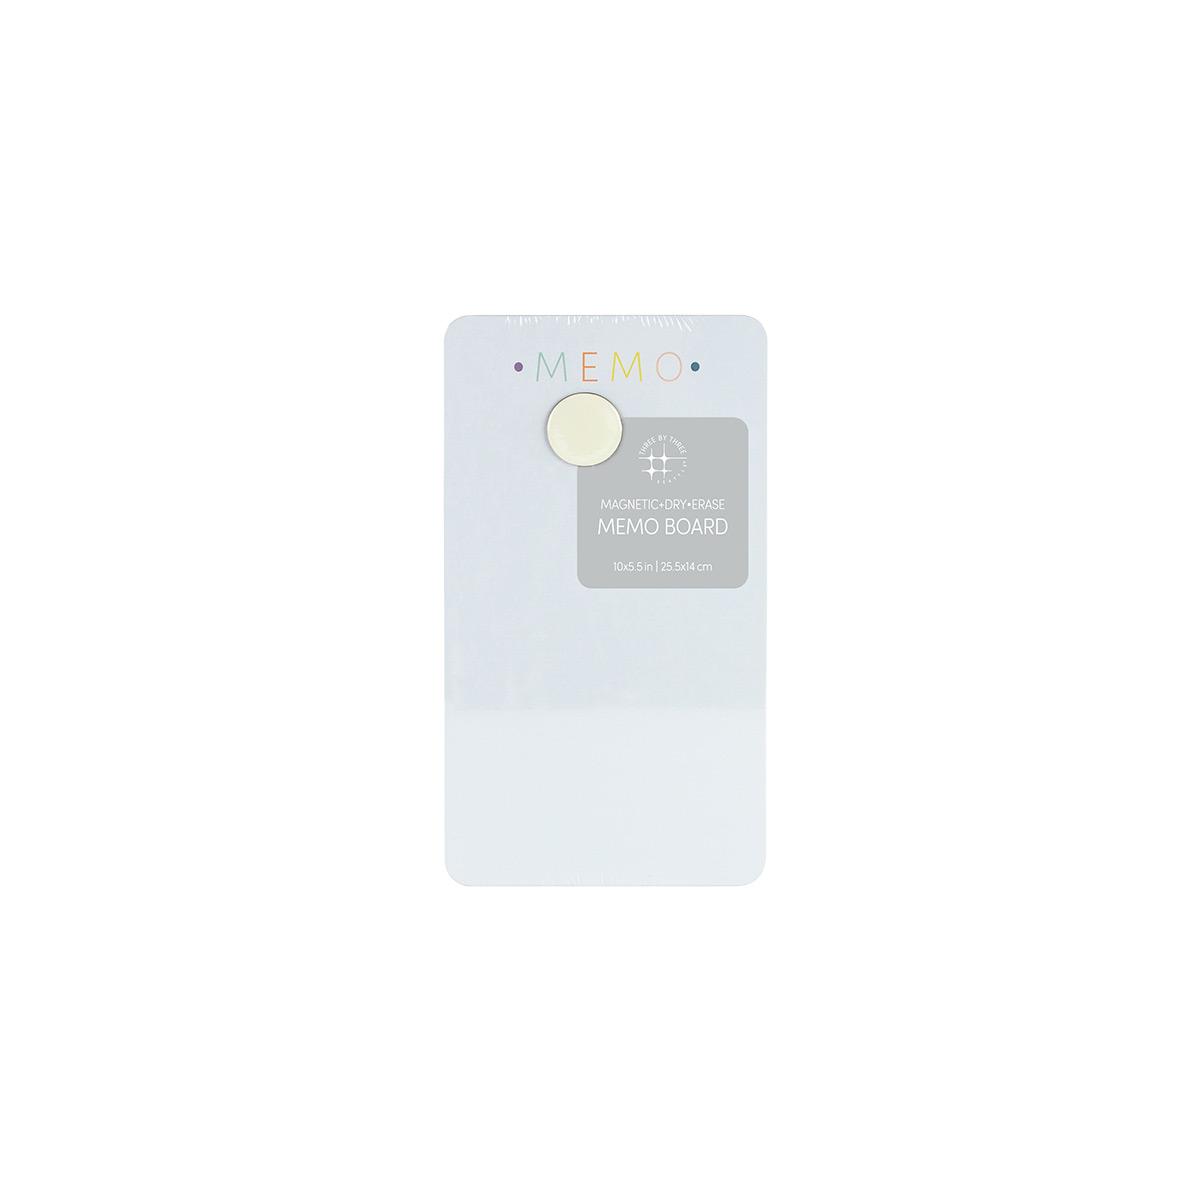 Memo Magnetic Dry Erase Board